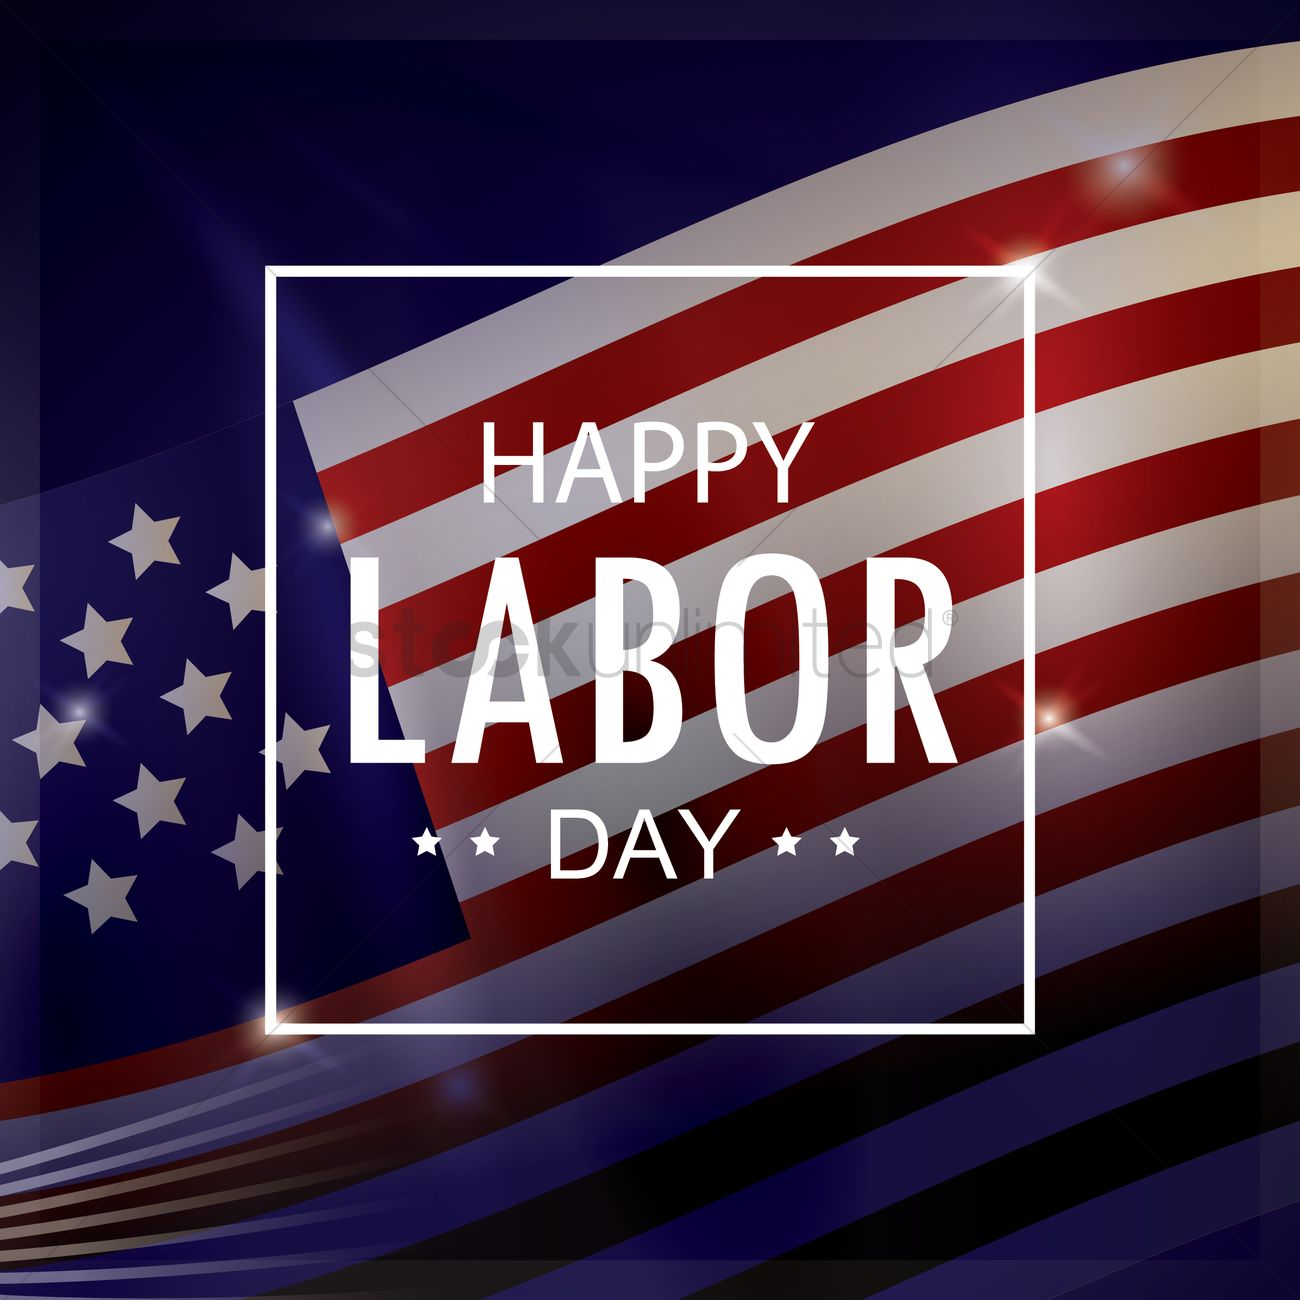 Happy Labor Day Wallpaper Vector Image